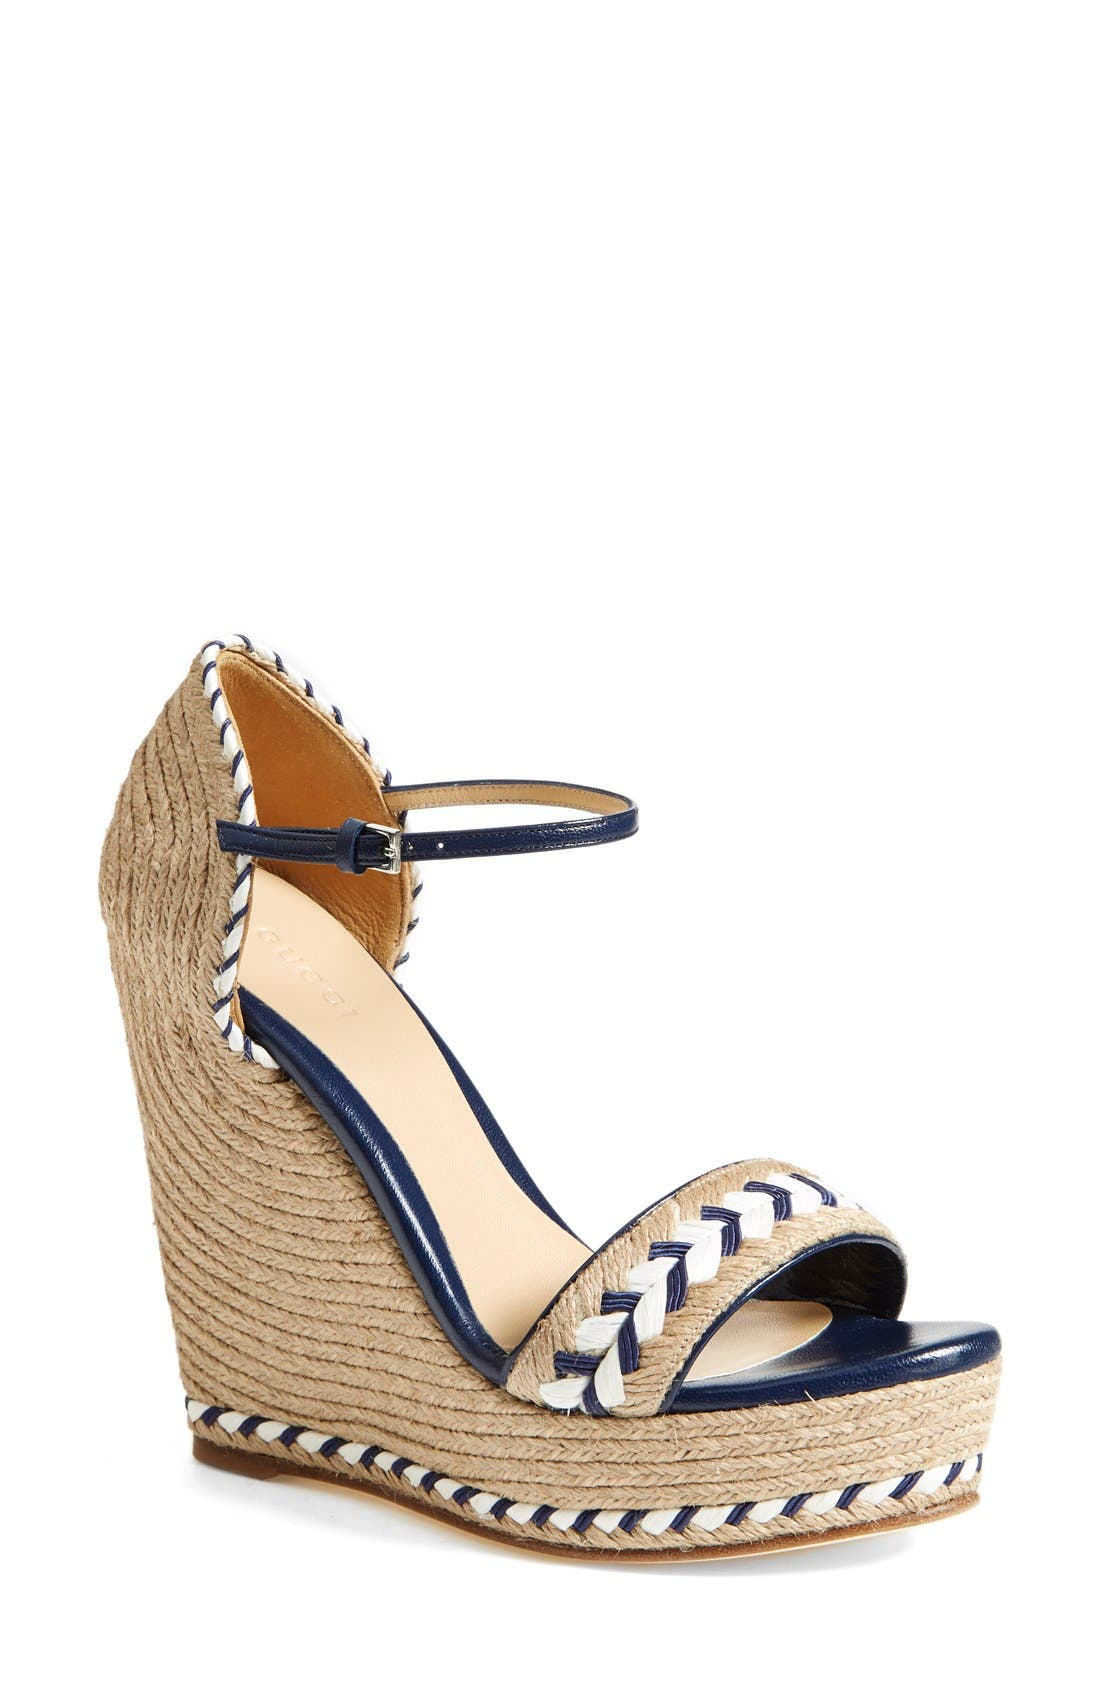 Alternate Image 1 Selected - Gucci 'Tiffany' Wedge Sandal (Women)